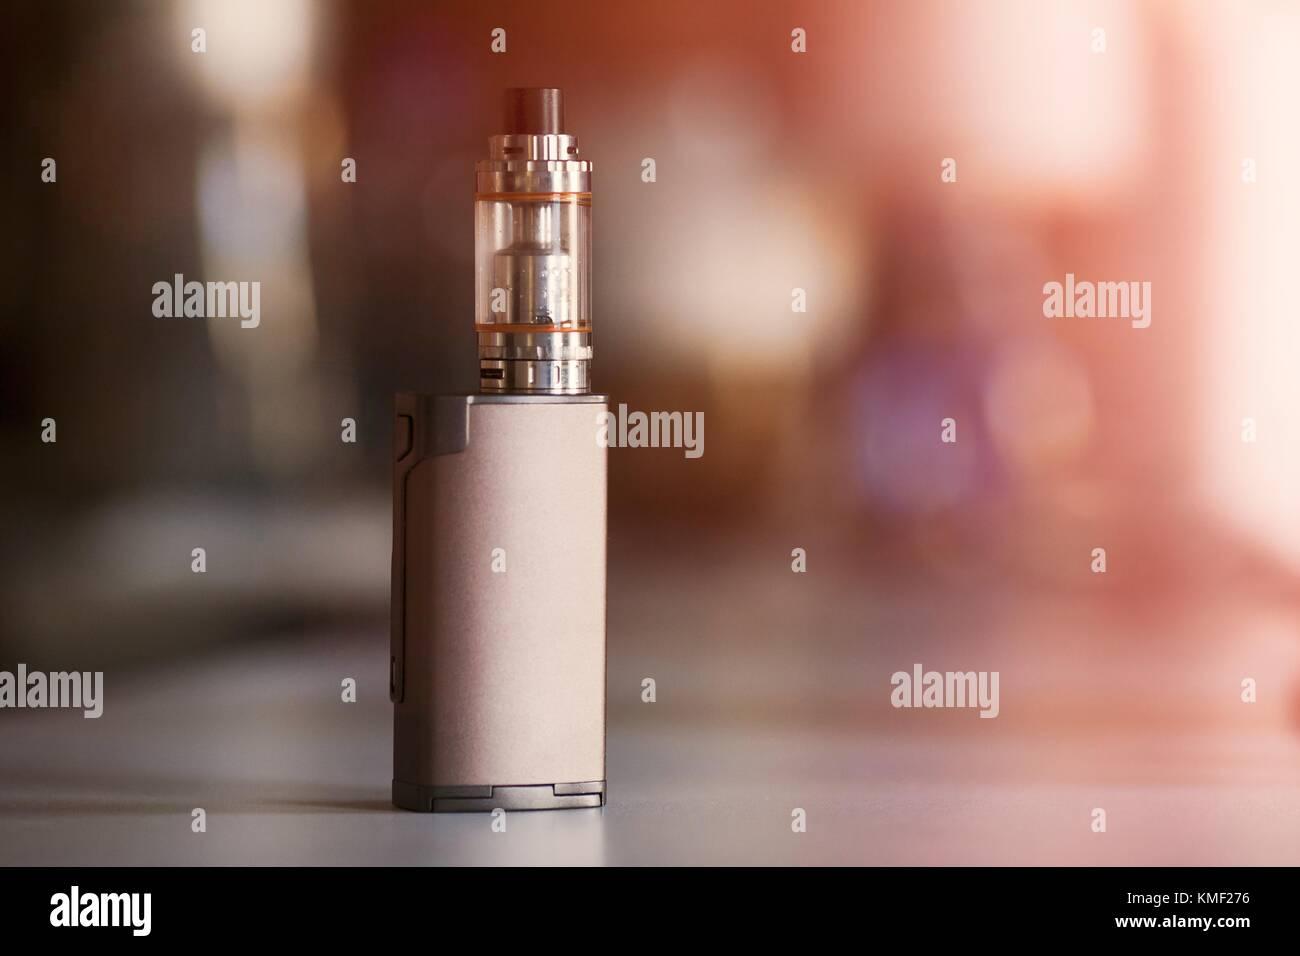 vape, electronic cigarette  blurred background  Popular